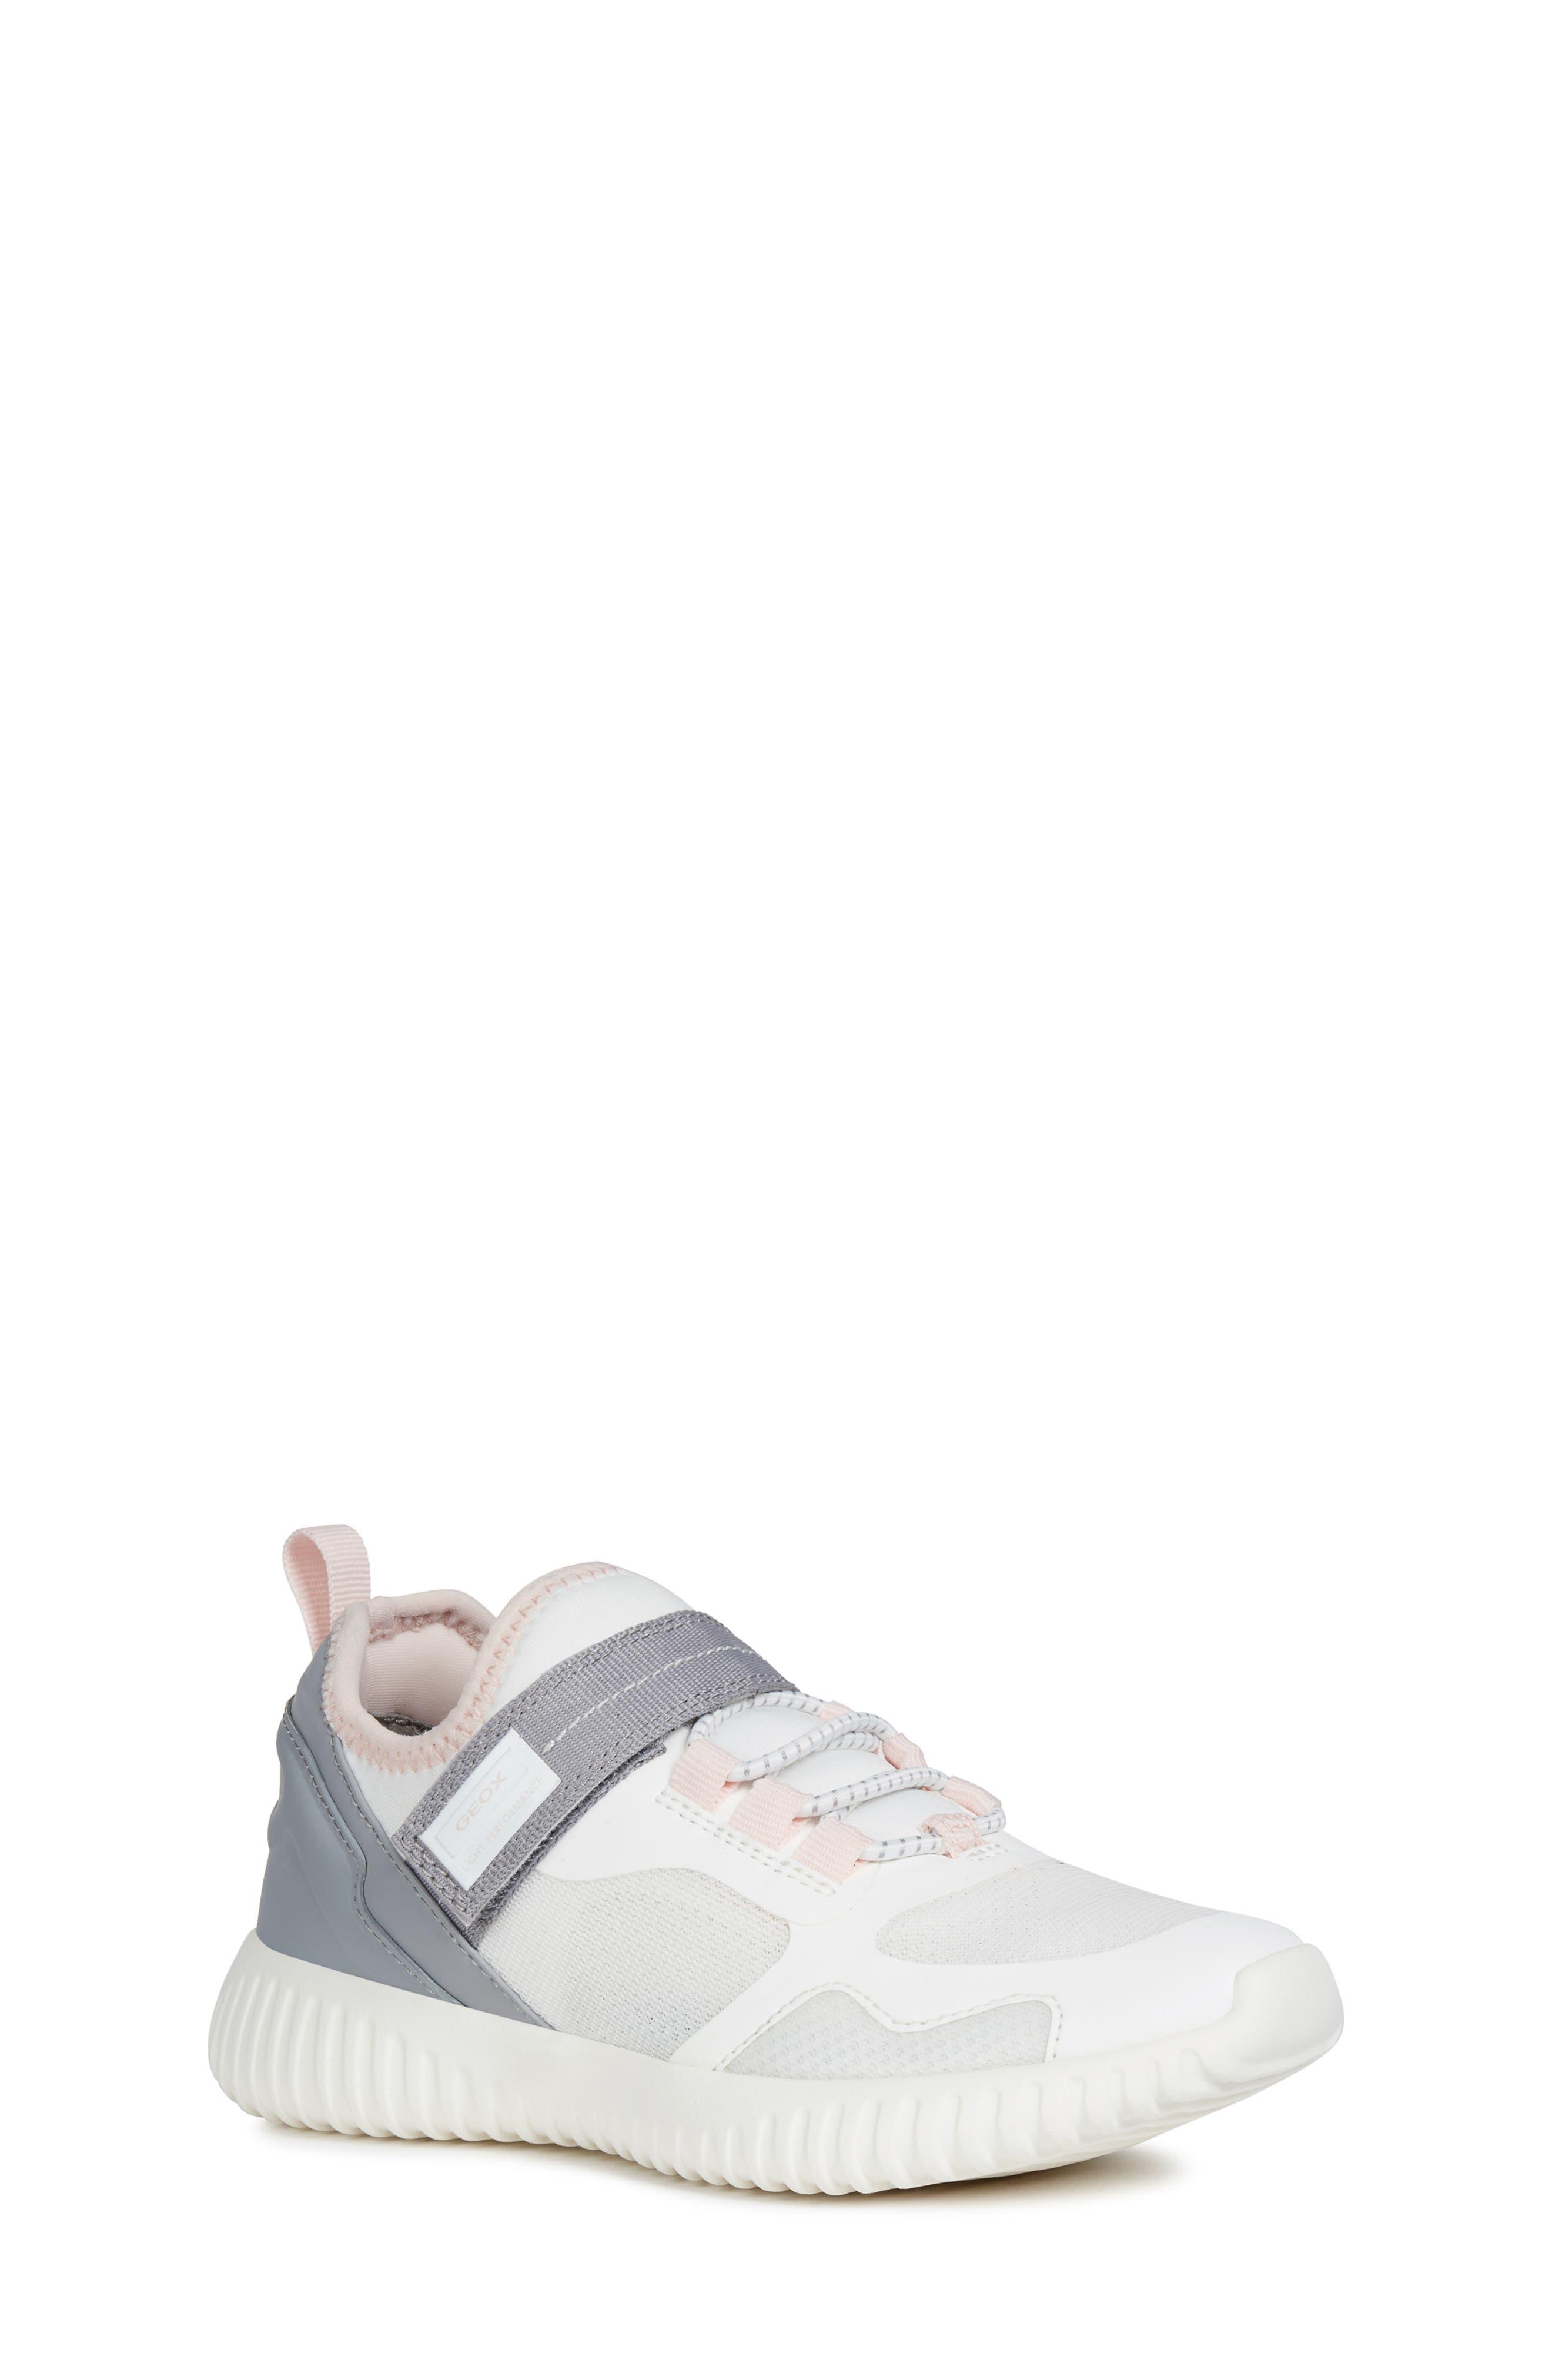 GEOX Waviness Sneaker, Main, color, WHITE/ GREY